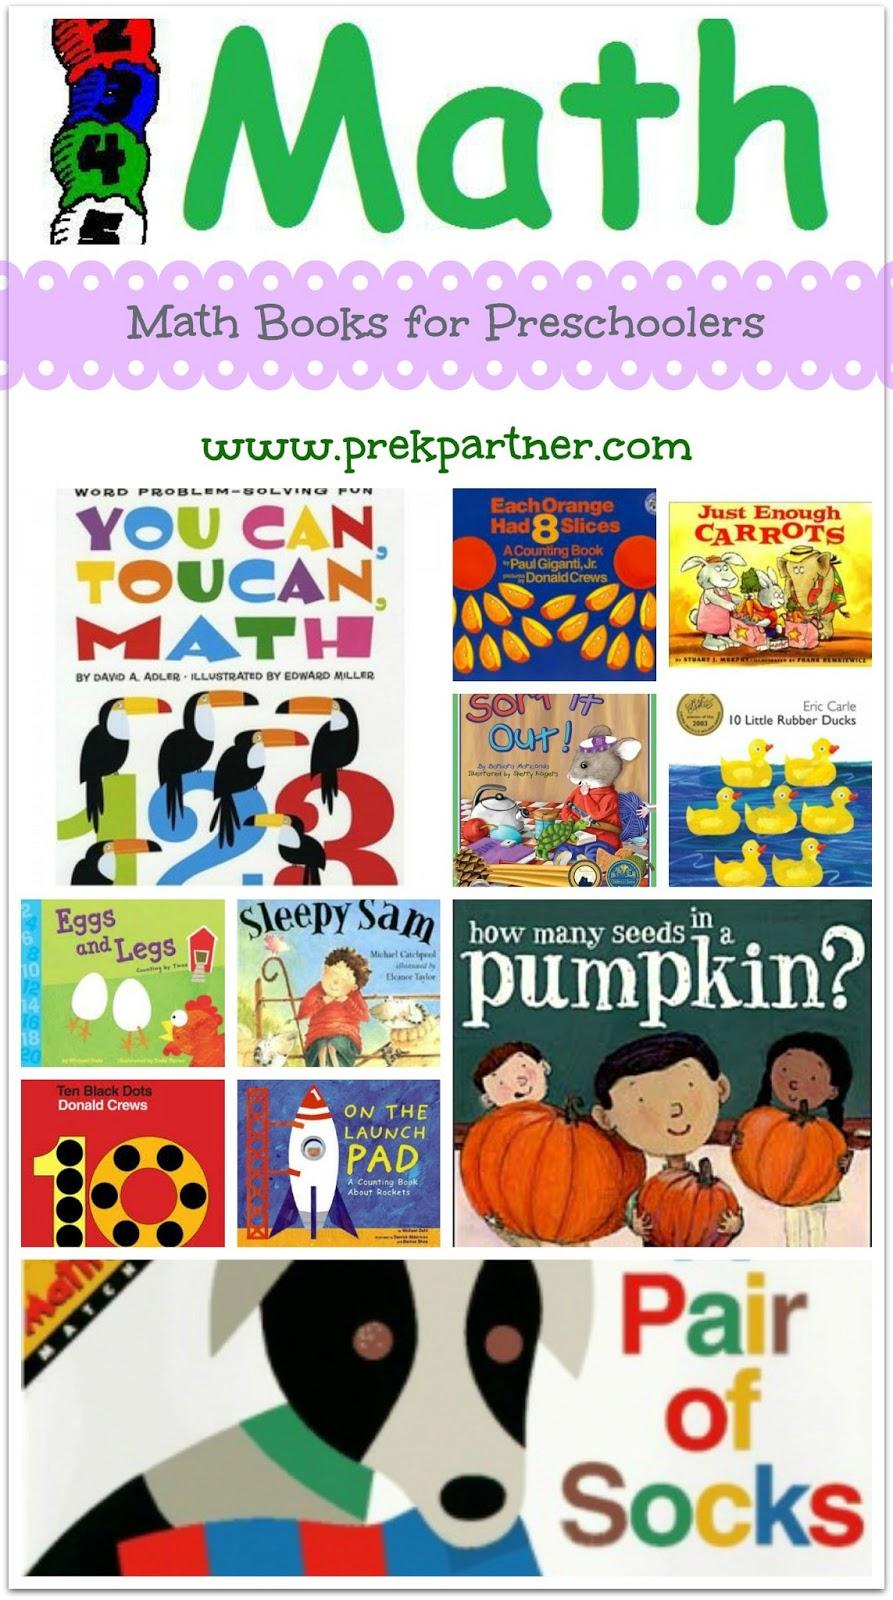 math books preschool preschoolers maths kindergarten children prekpartner teaching sorting library science activities homework help google curriculum australian literature reading